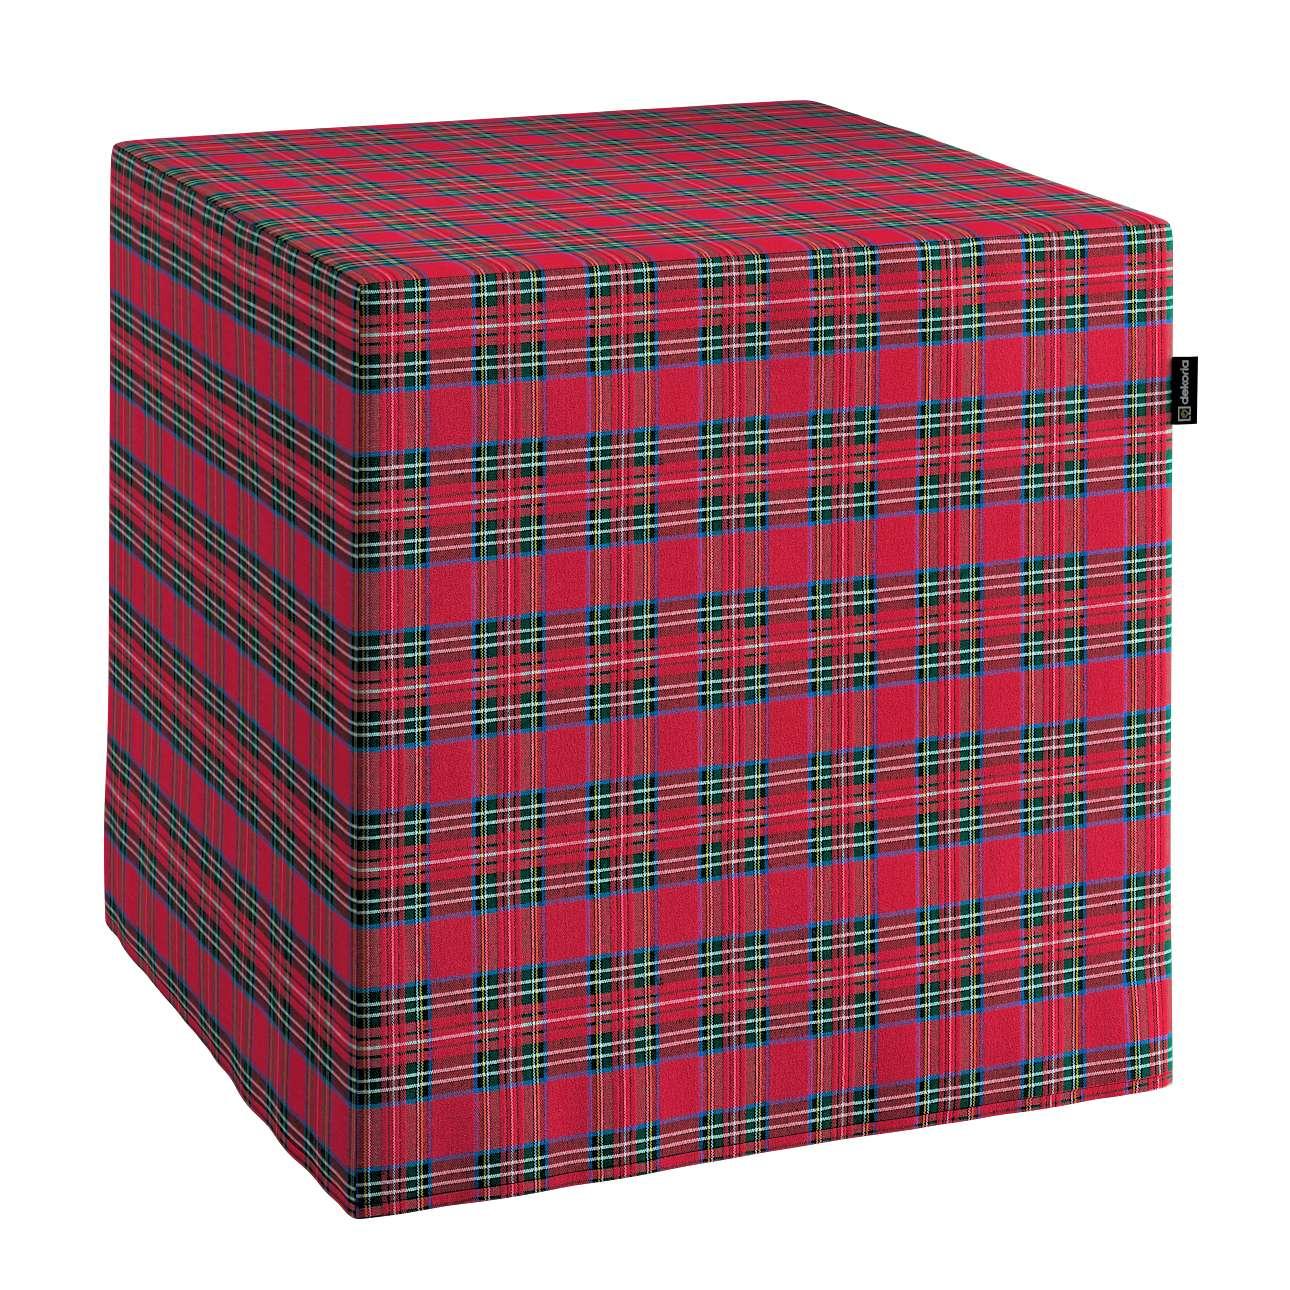 Sedák Cube - kostka pevná 40x40x40 v kolekci Bristol, látka: 126-29